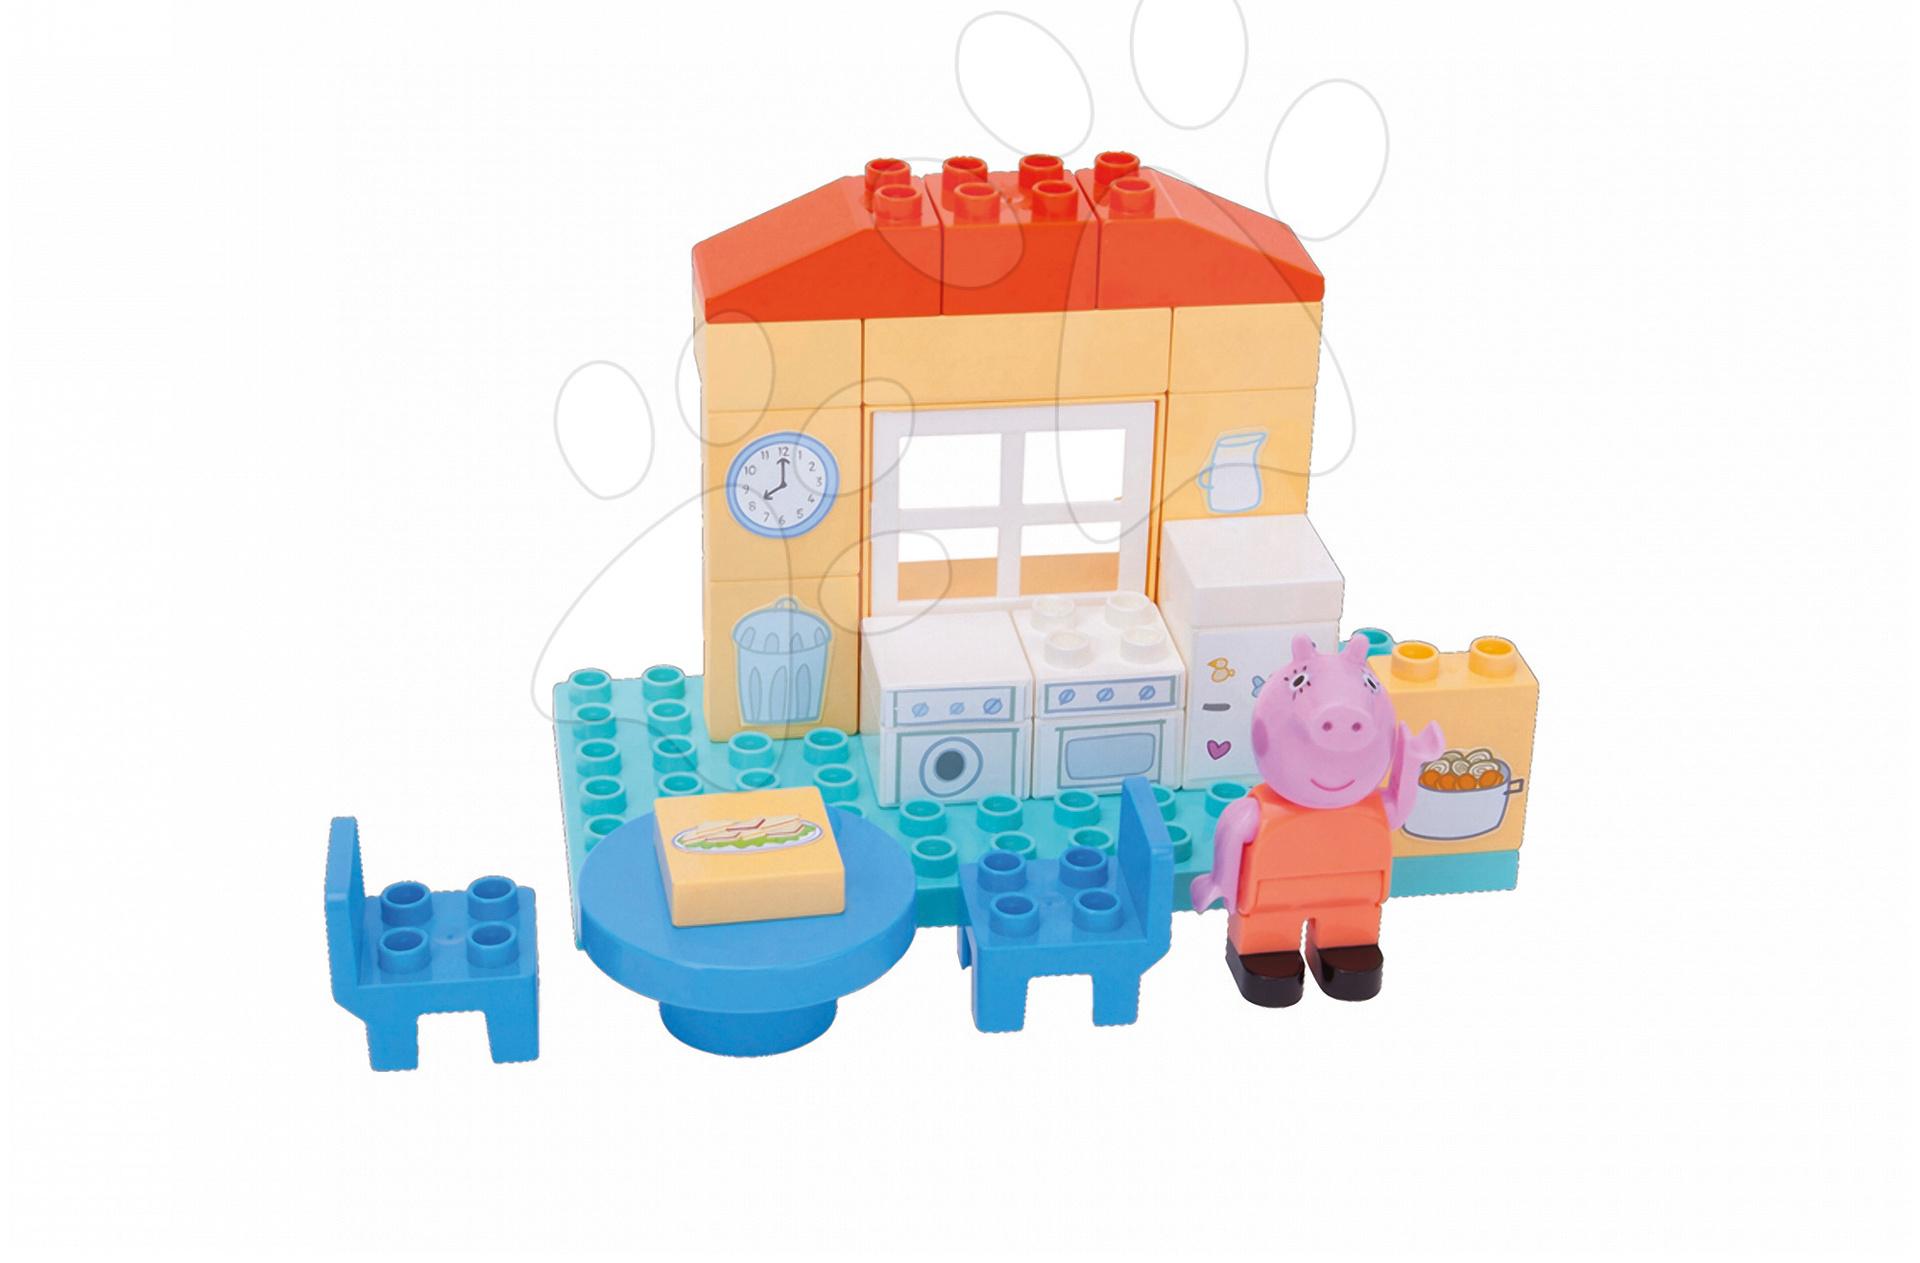 BIG detská stavebnica Peppa Pig v kuchyni PlayBIG Bloxx 57102-C